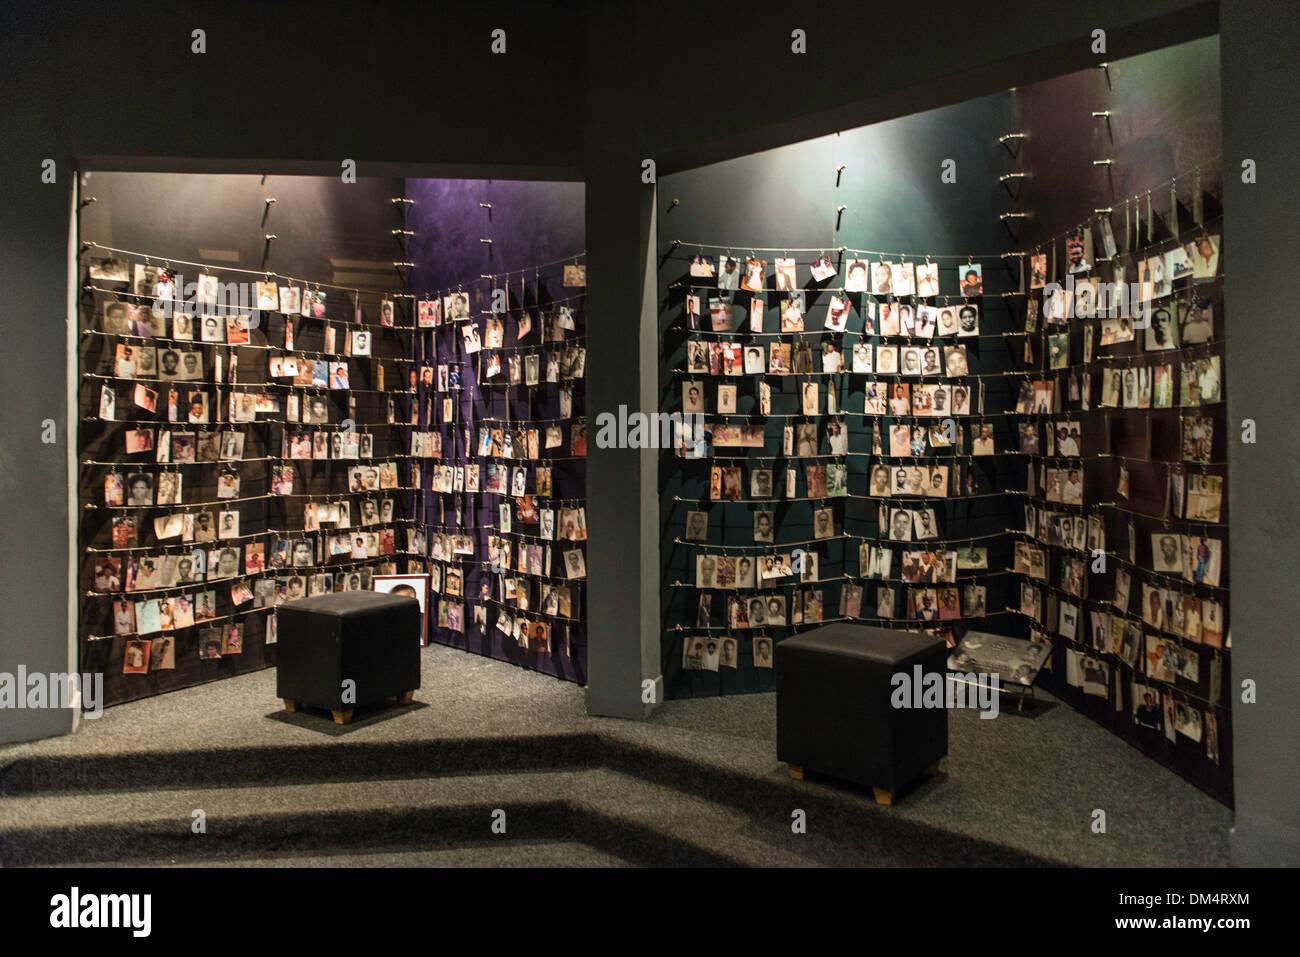 Kigali Genocide Memorial Centre Rwanda Africa Stock Photo